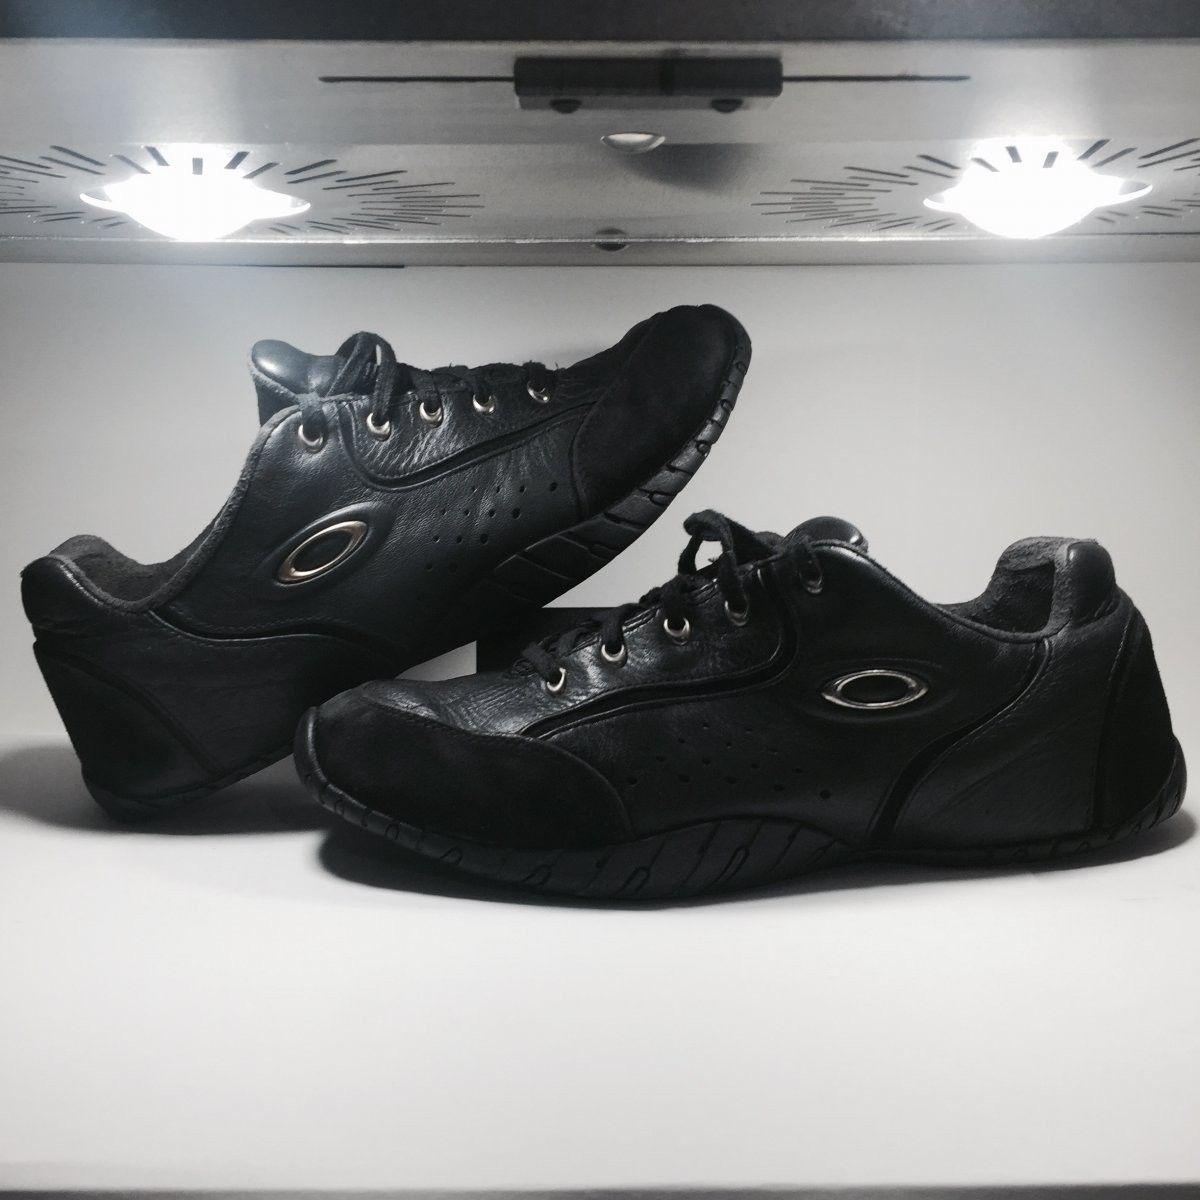 Oakley Shoes Size 12.5 Original Rip Cords Black/Chrome - Oakley Rip Cord Black Chrome (4).jpg